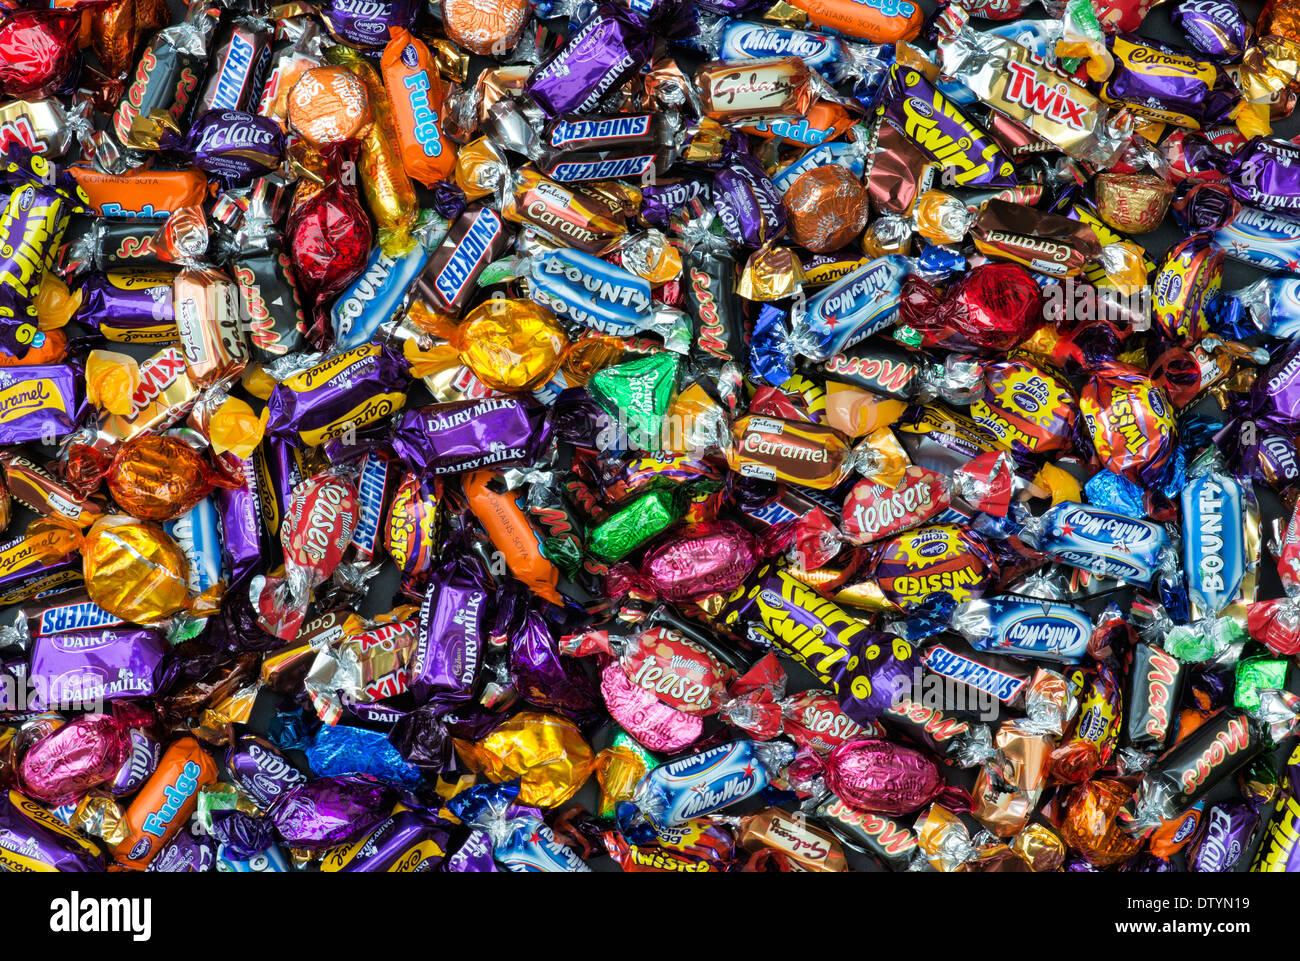 Celebration Chocolates. Assorted Mini Chocolates Pattern. Chocolate sweet wrappers pattern - Stock Image